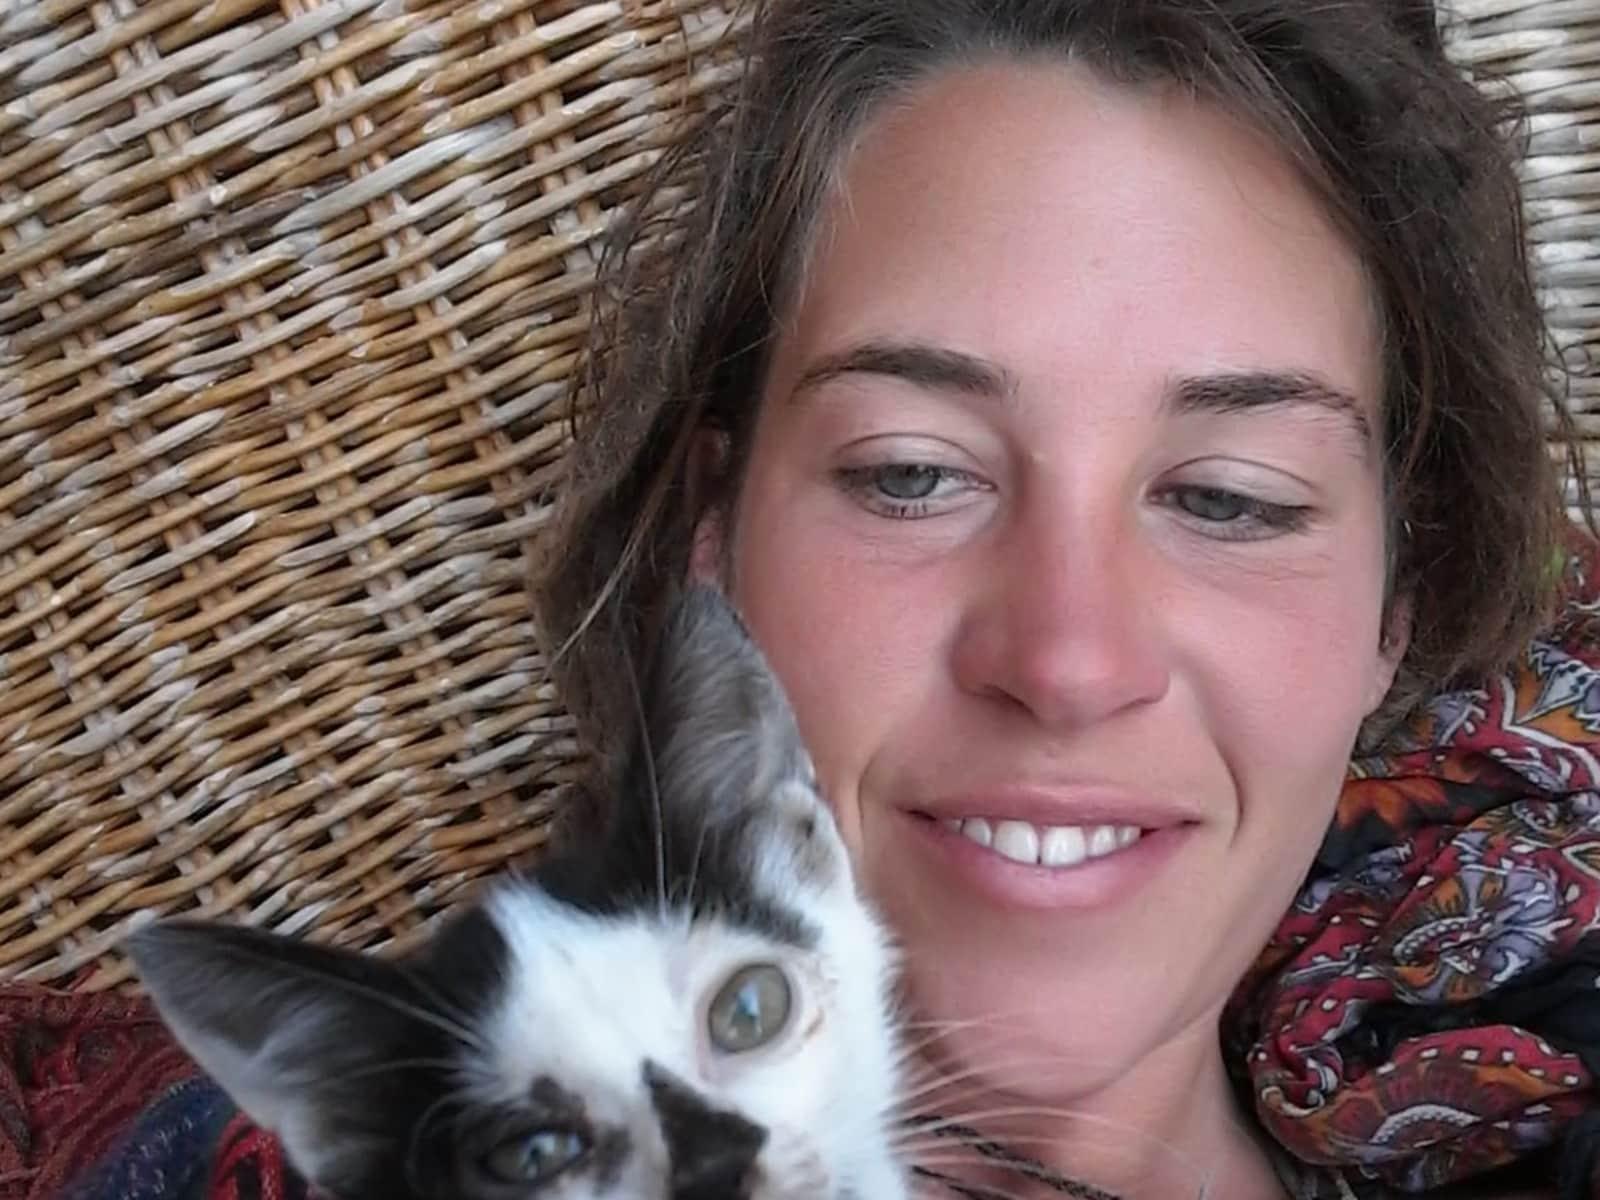 Jess from Šibenik, Croatia